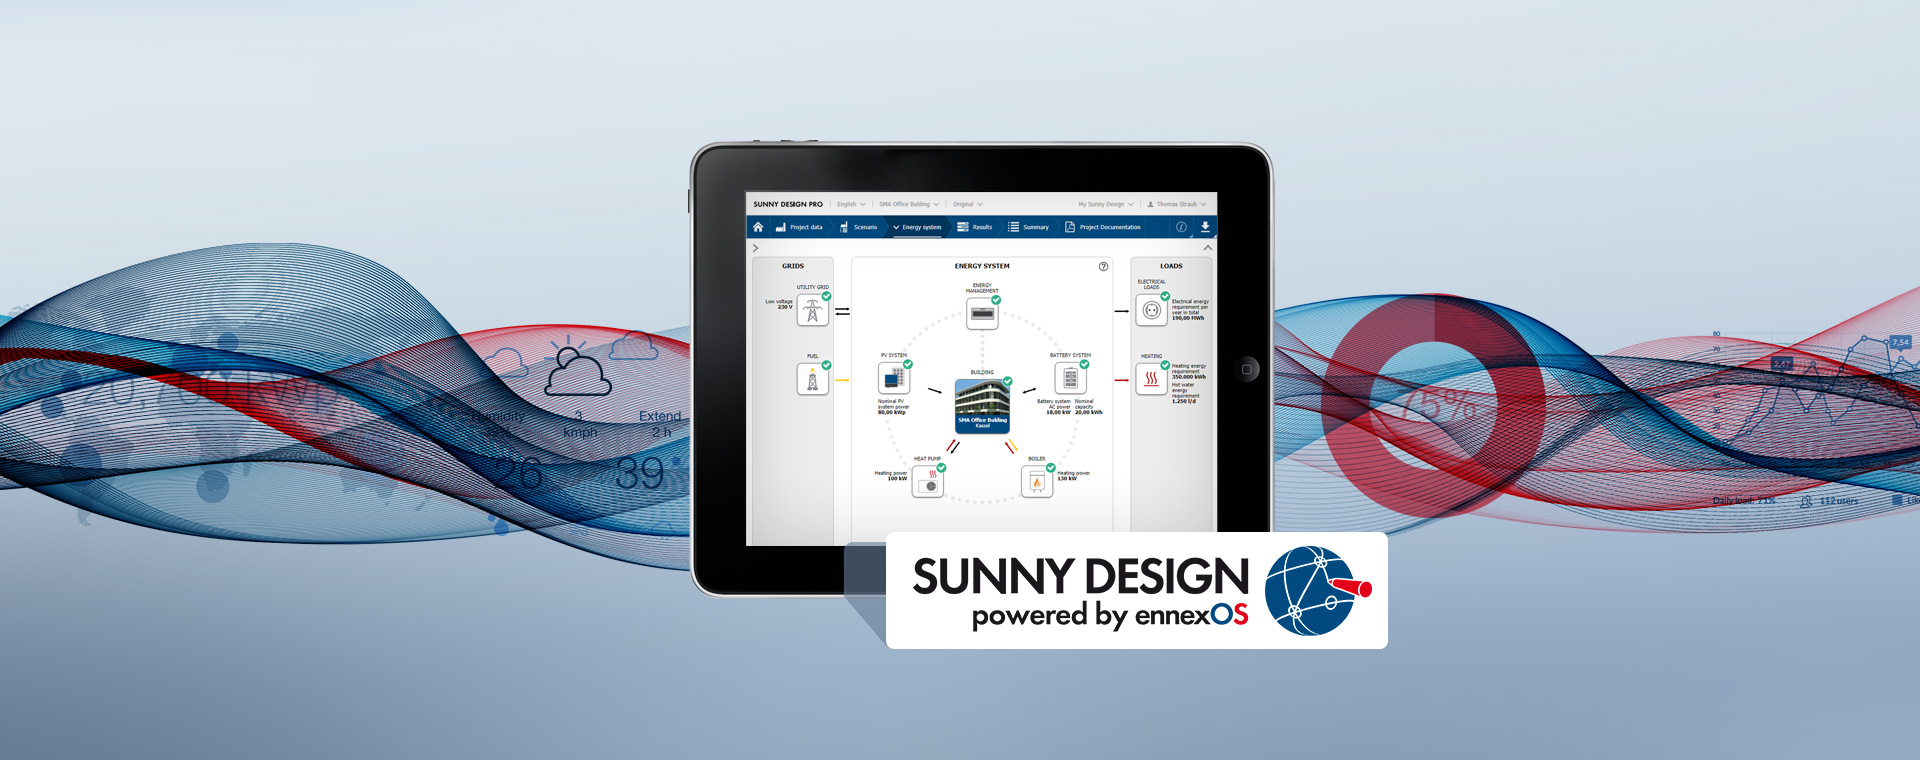 Www Pro Design Com sunny design pro - sma ennexos - cross sector energy management